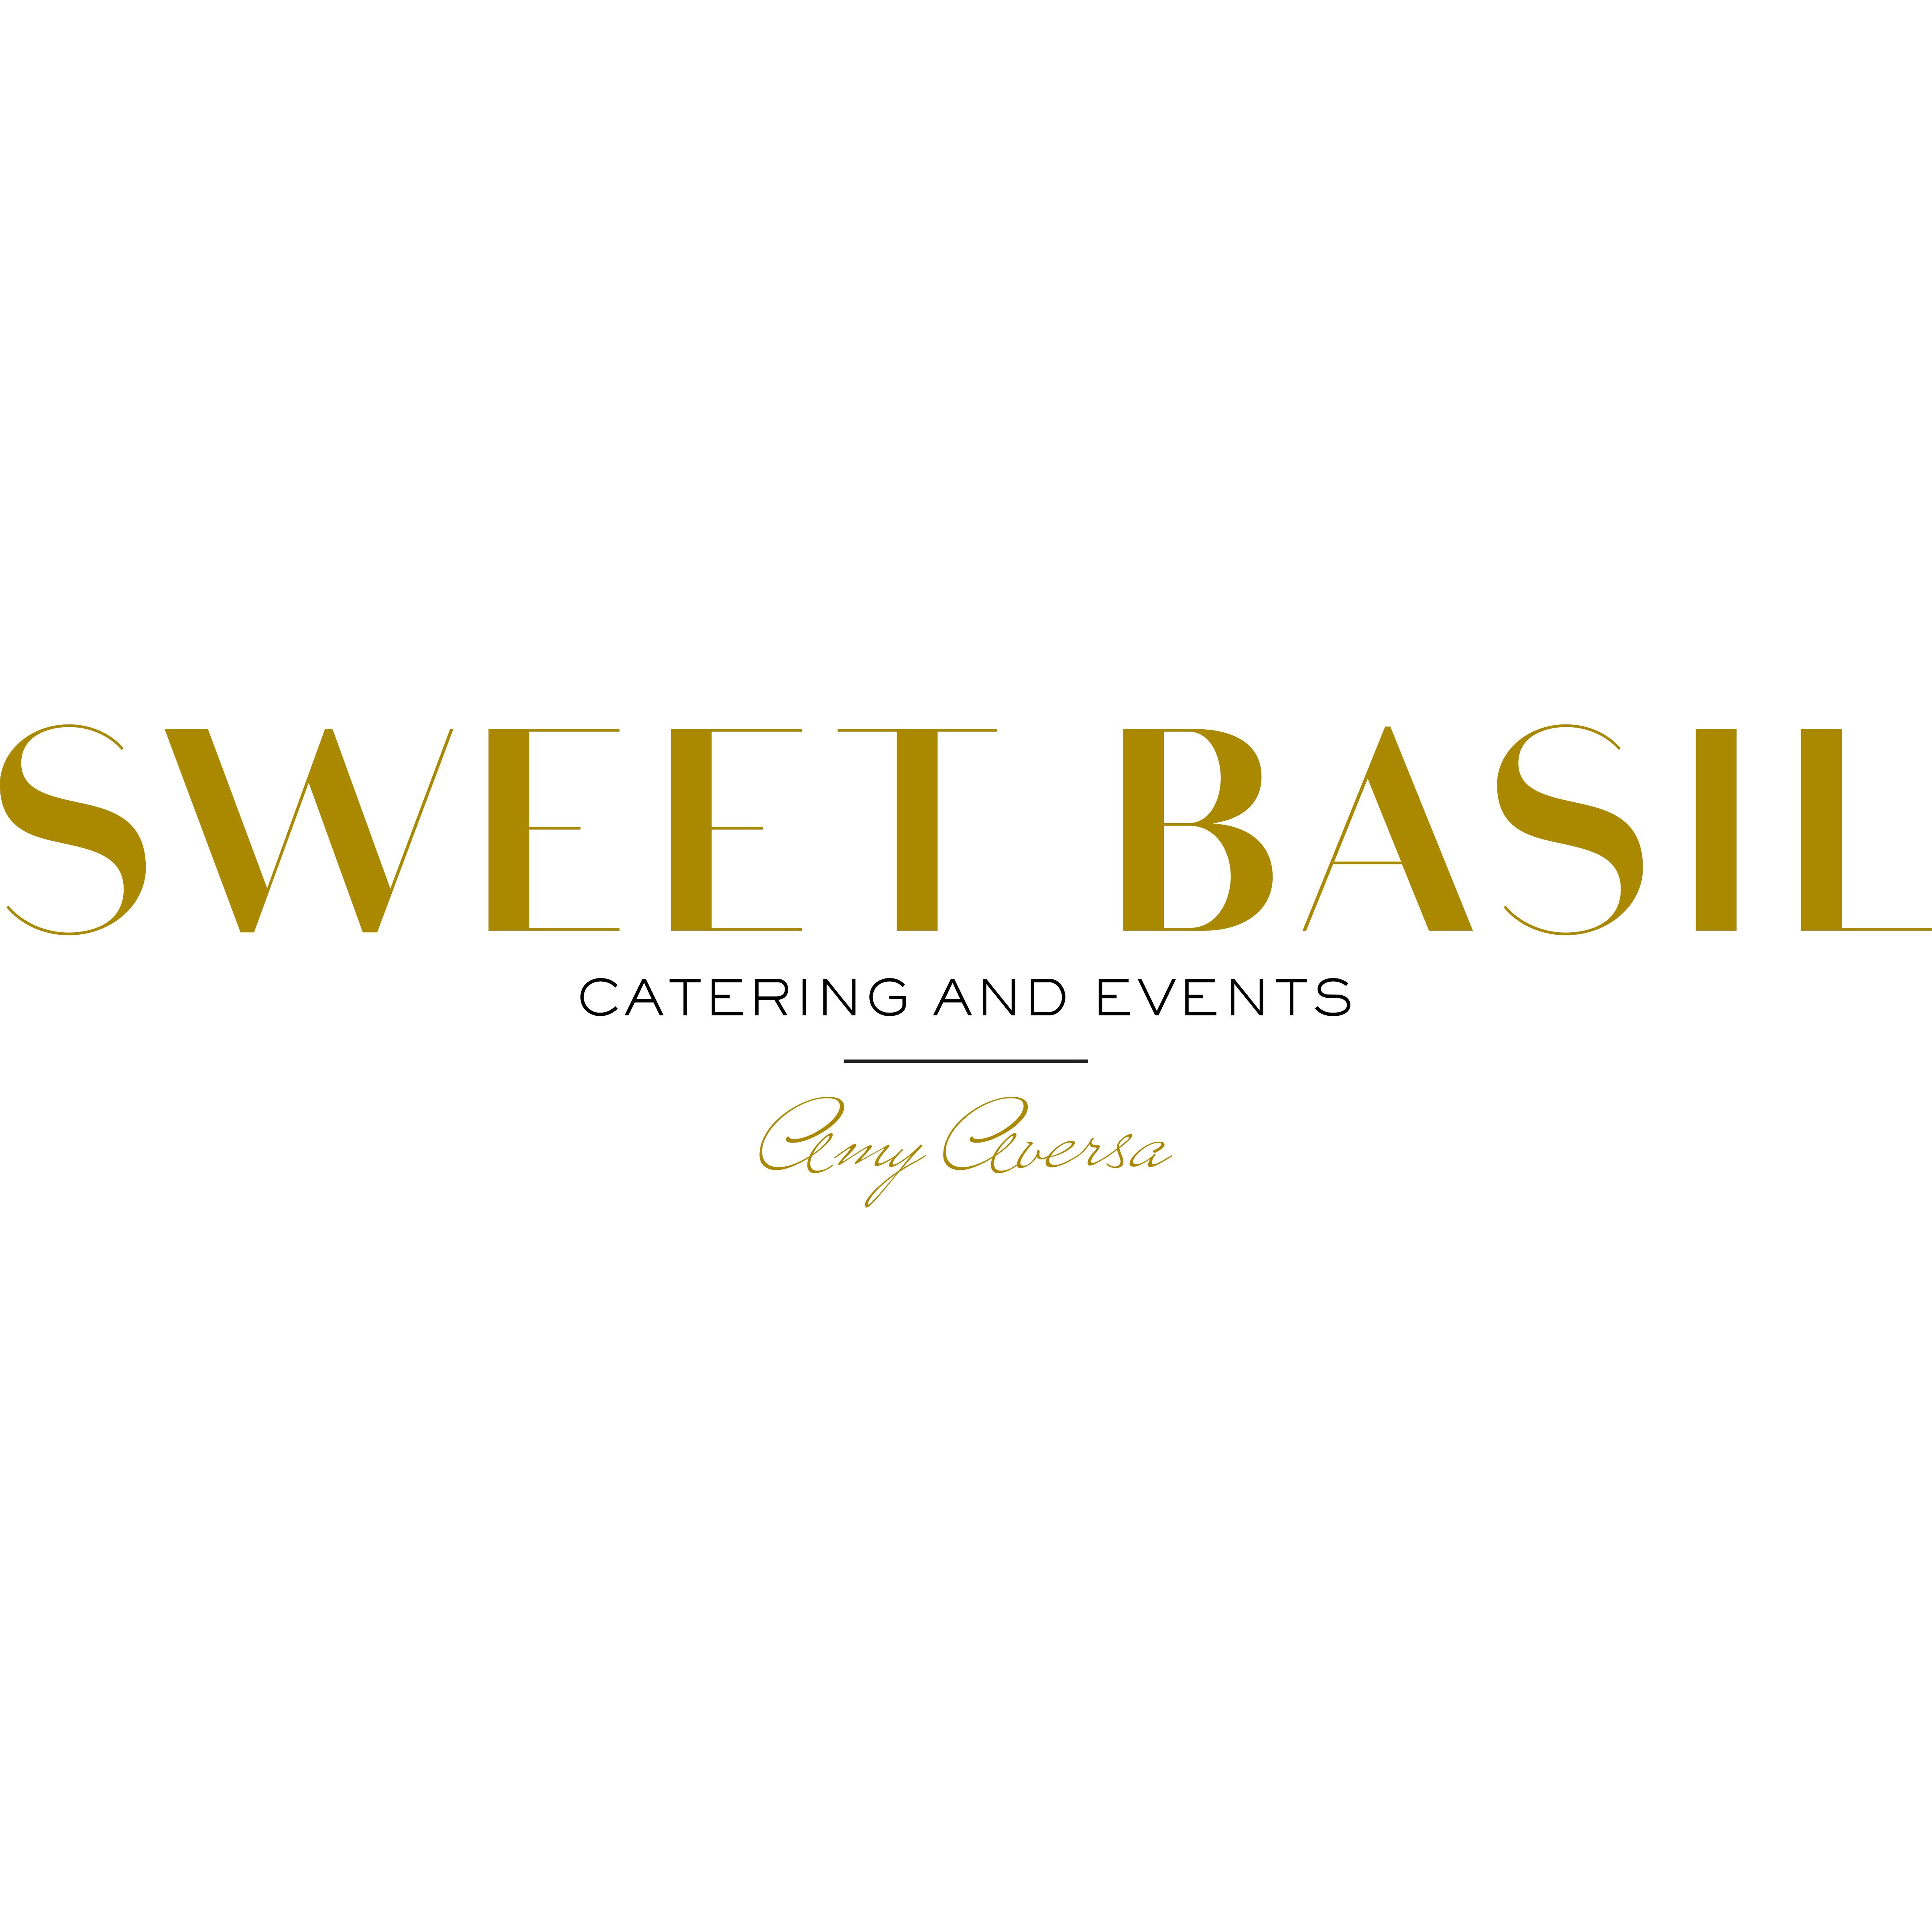 Sweet Basil Catering